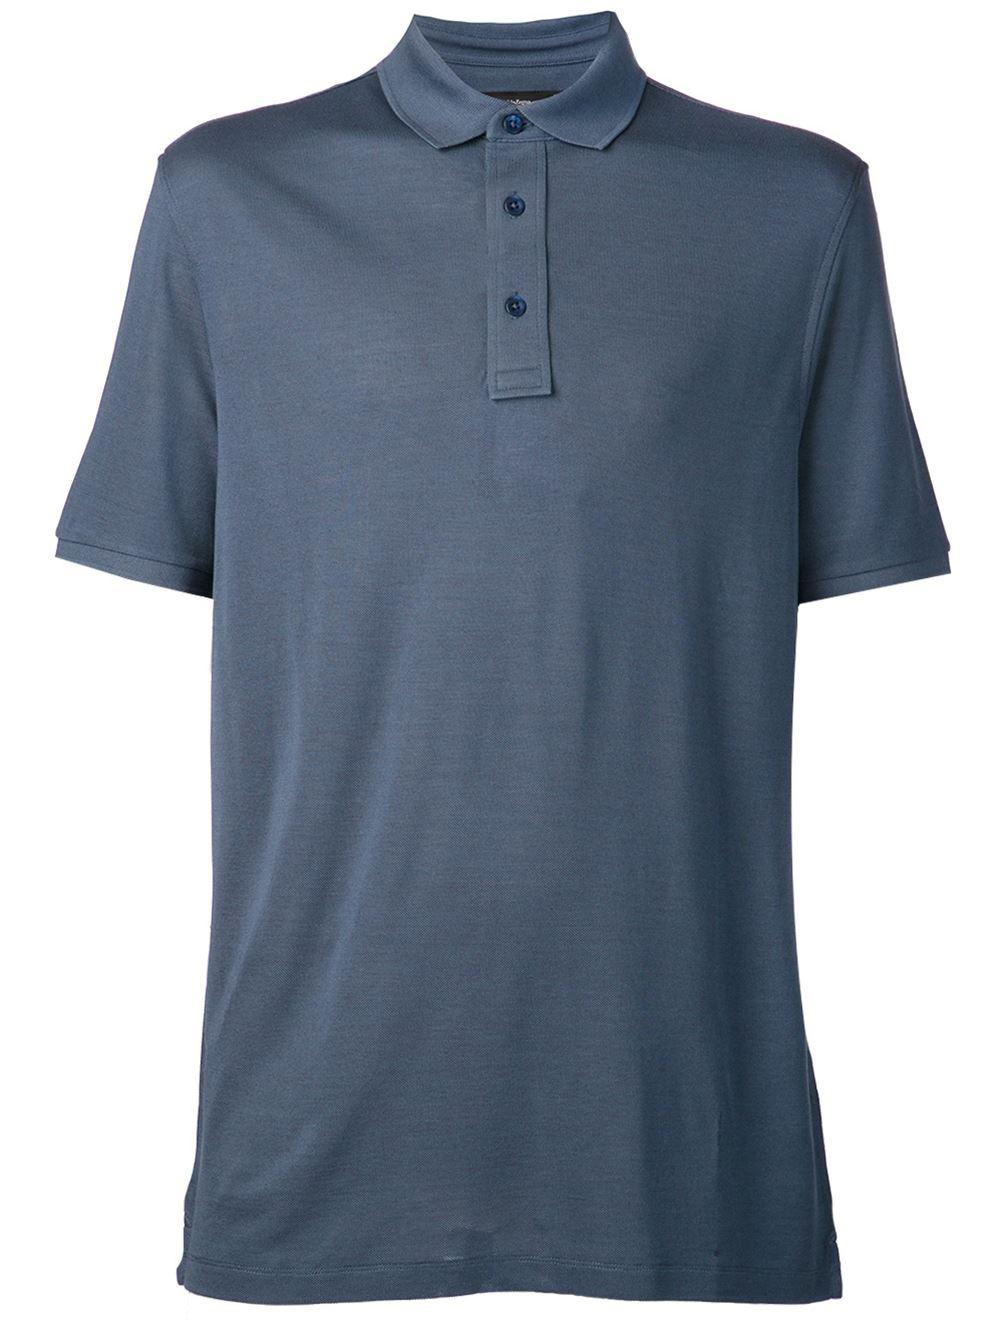 ermenegildo zegna classic polo shirt in blue for men lyst. Black Bedroom Furniture Sets. Home Design Ideas